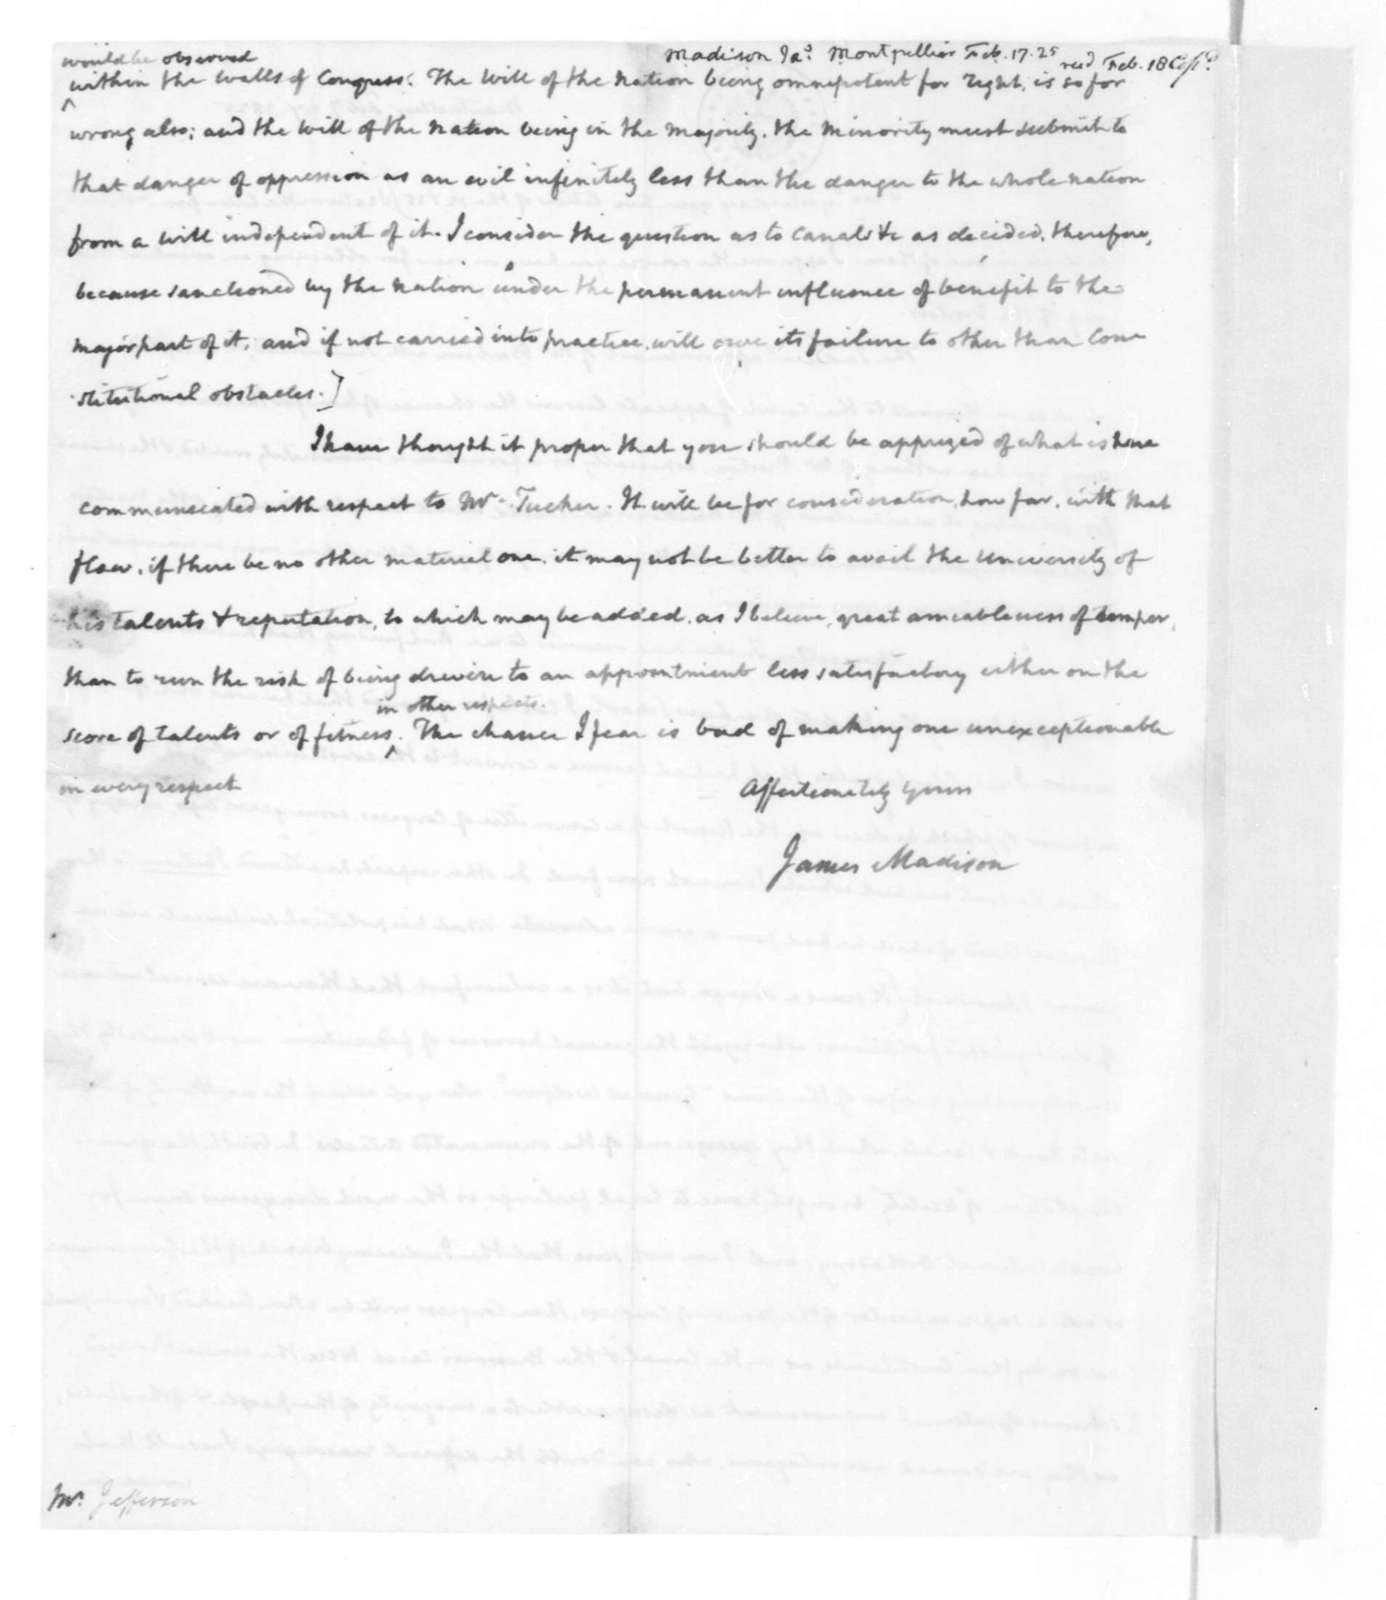 James Madison to Thomas Jefferson, February 17, 1825. With Copy.